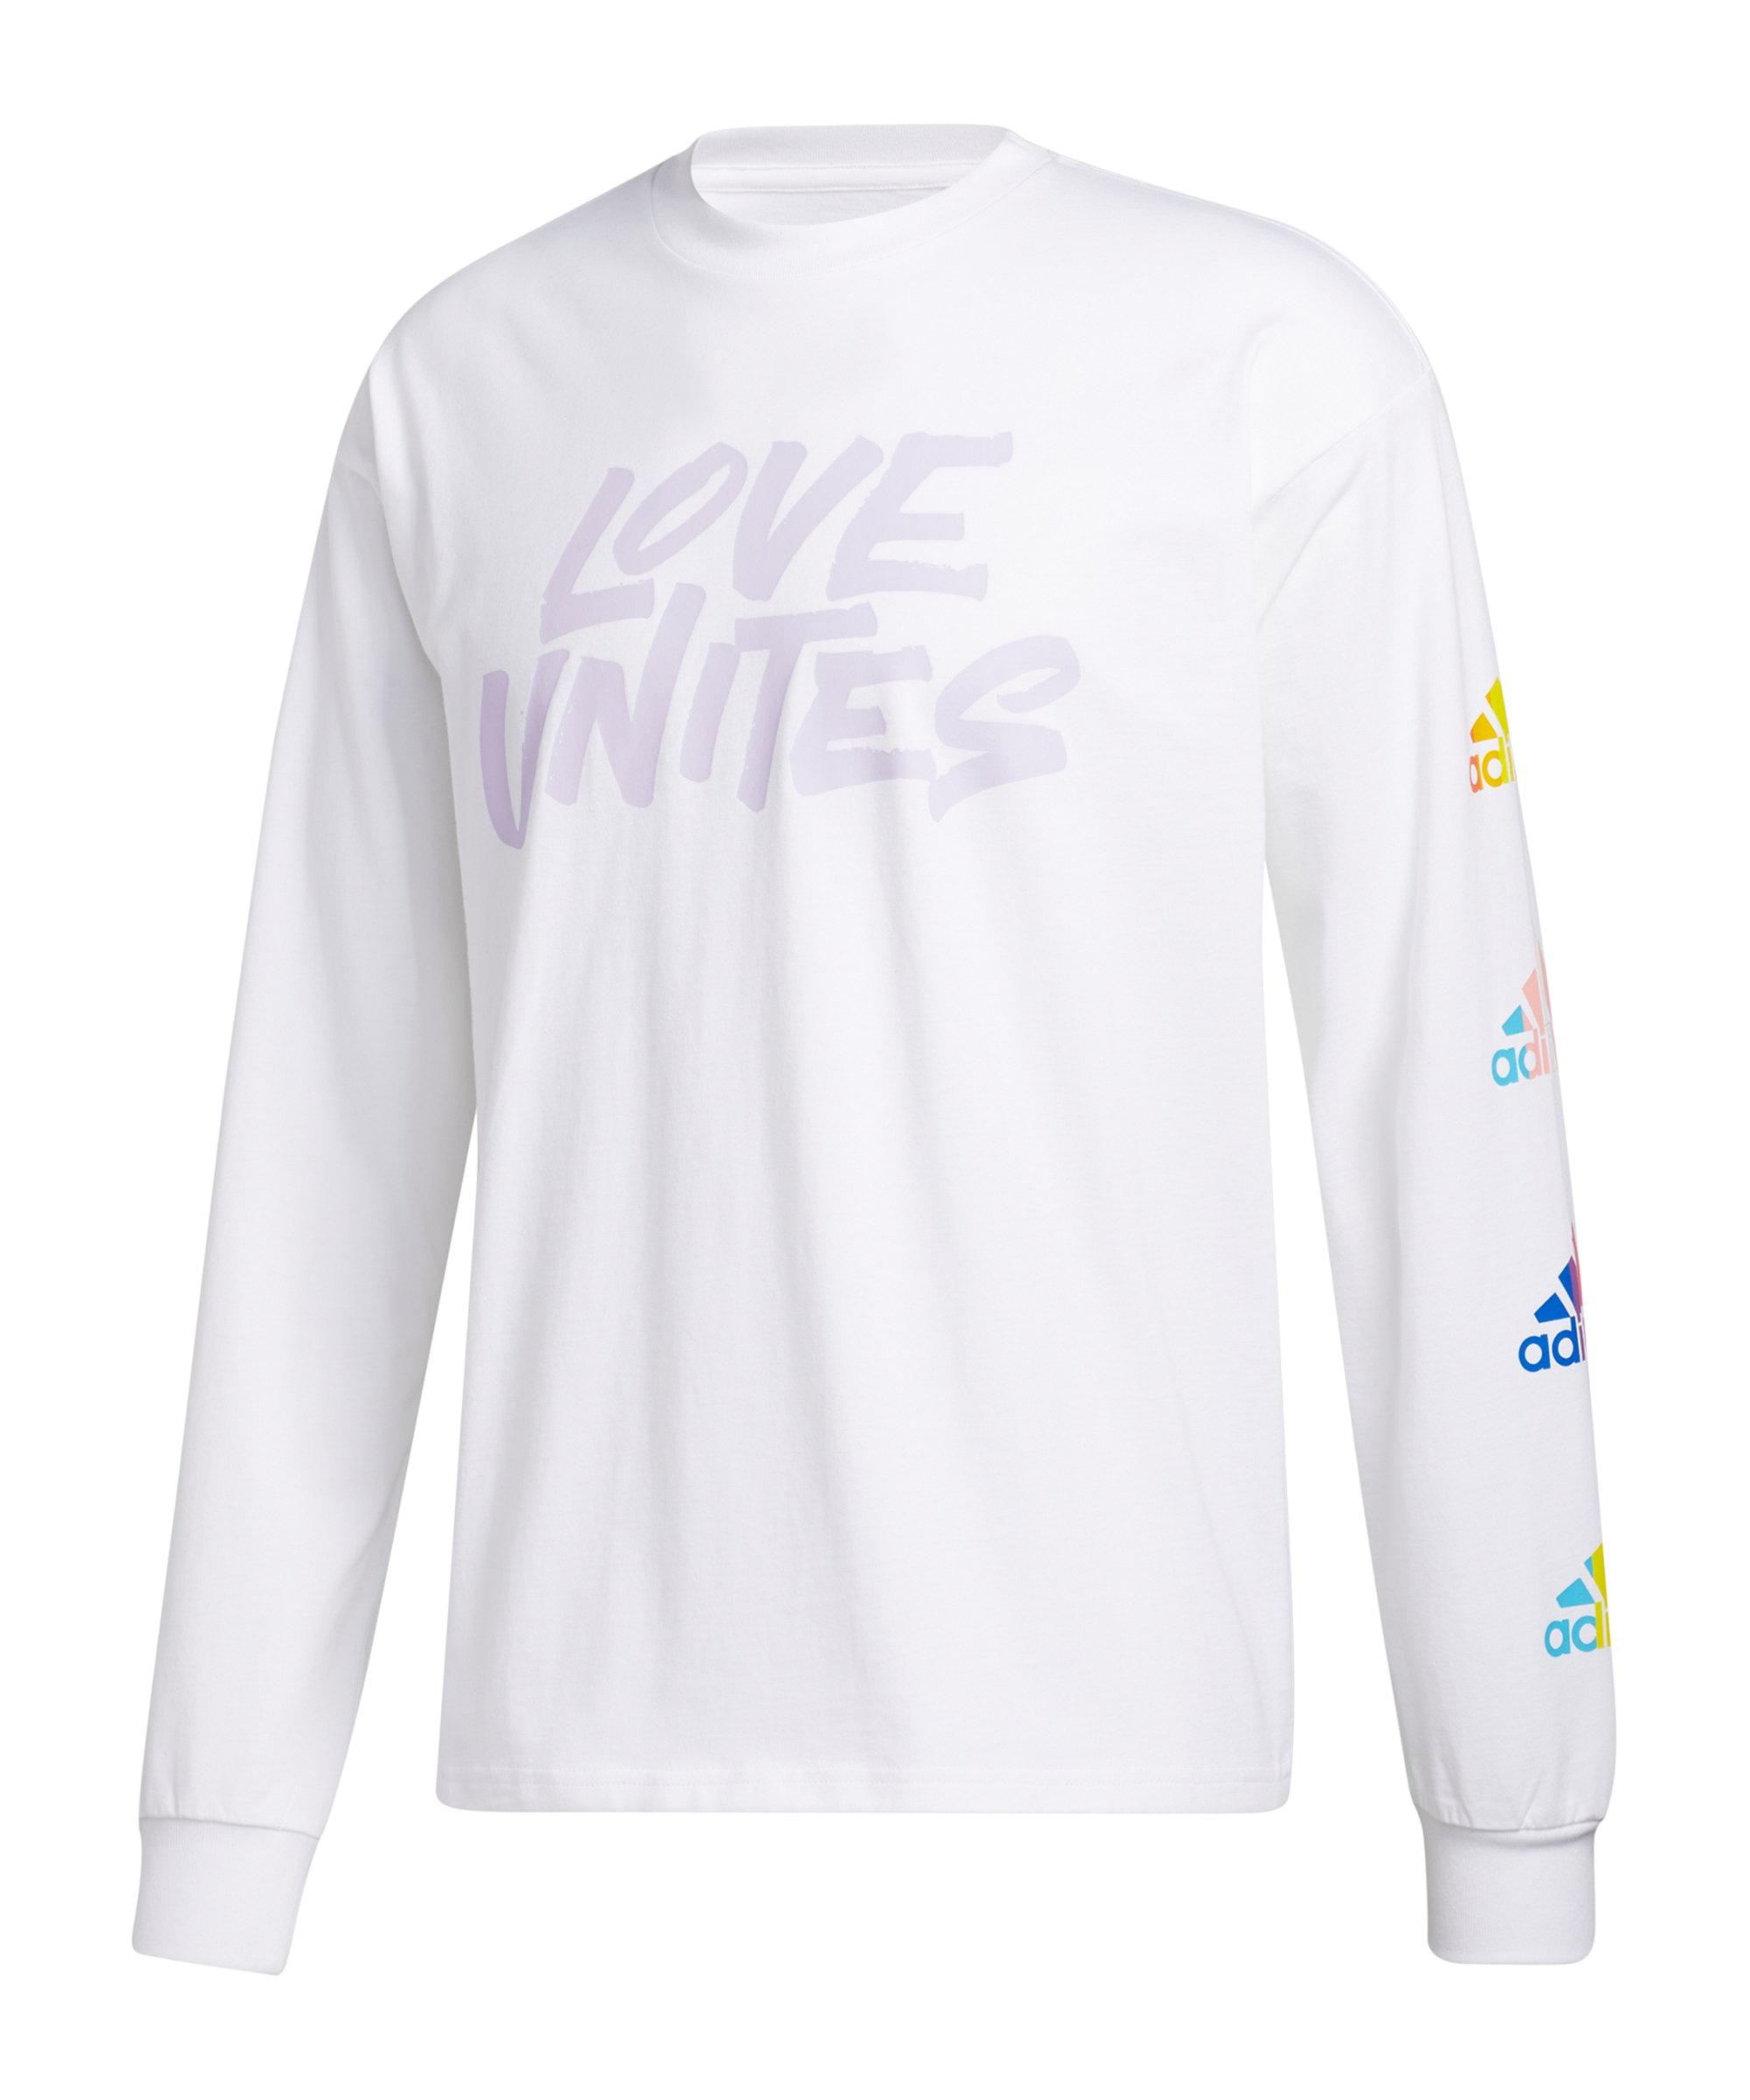 adidas Pride Unites Sweatshirt Weiss - weiss